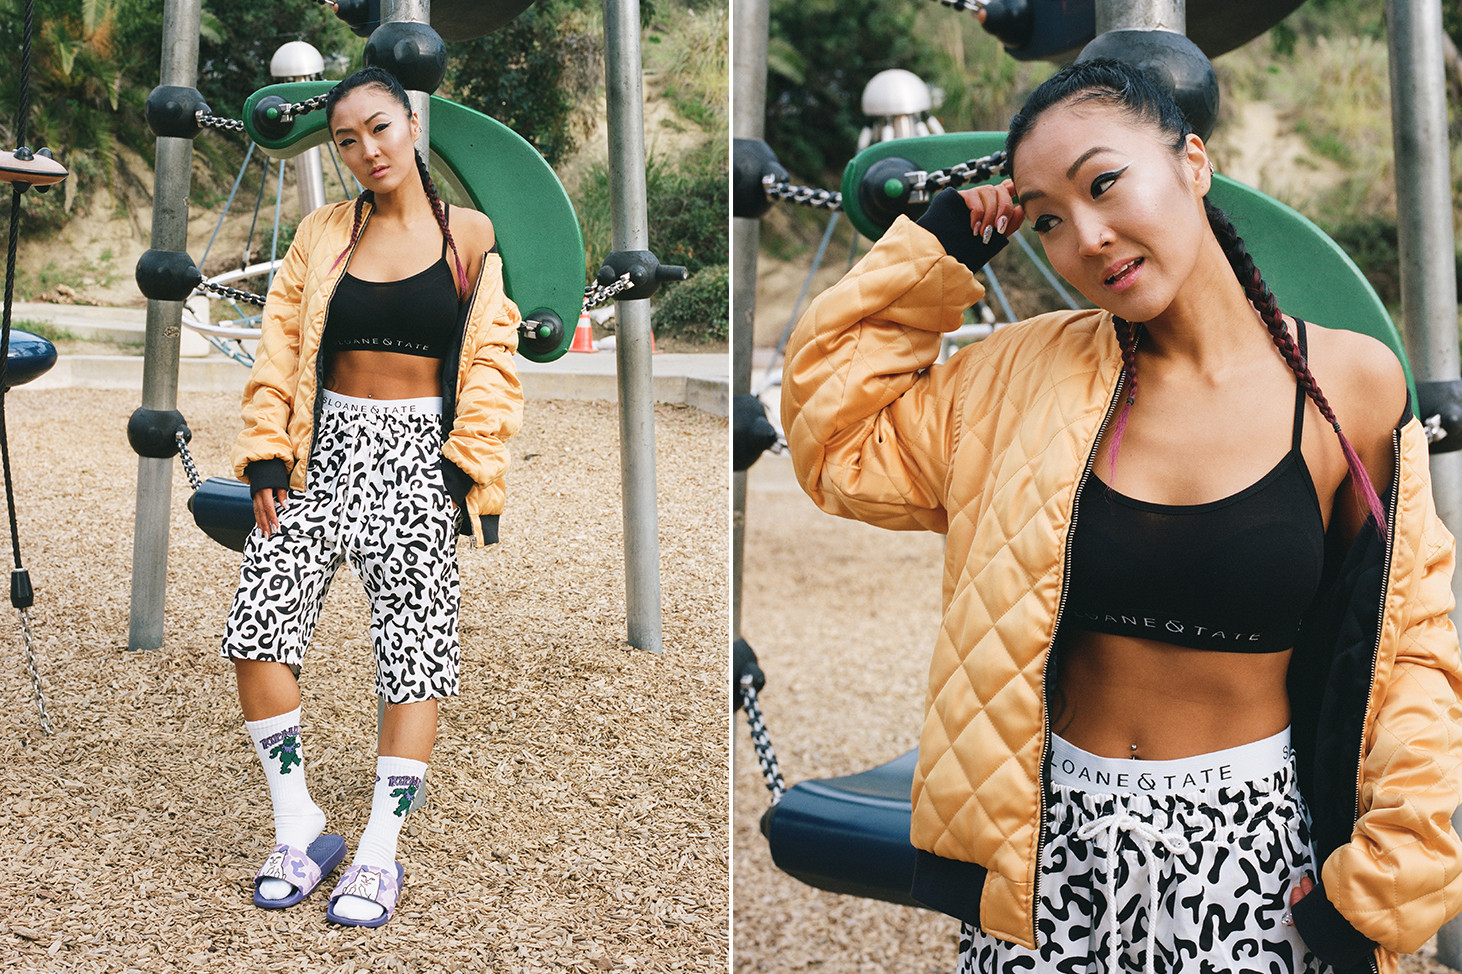 Lydia Paek YG Entertainment Interview Feature Dancer Musician Songwriter Big Bang K Pop CL Pharrell 2NE1 Body Image Career